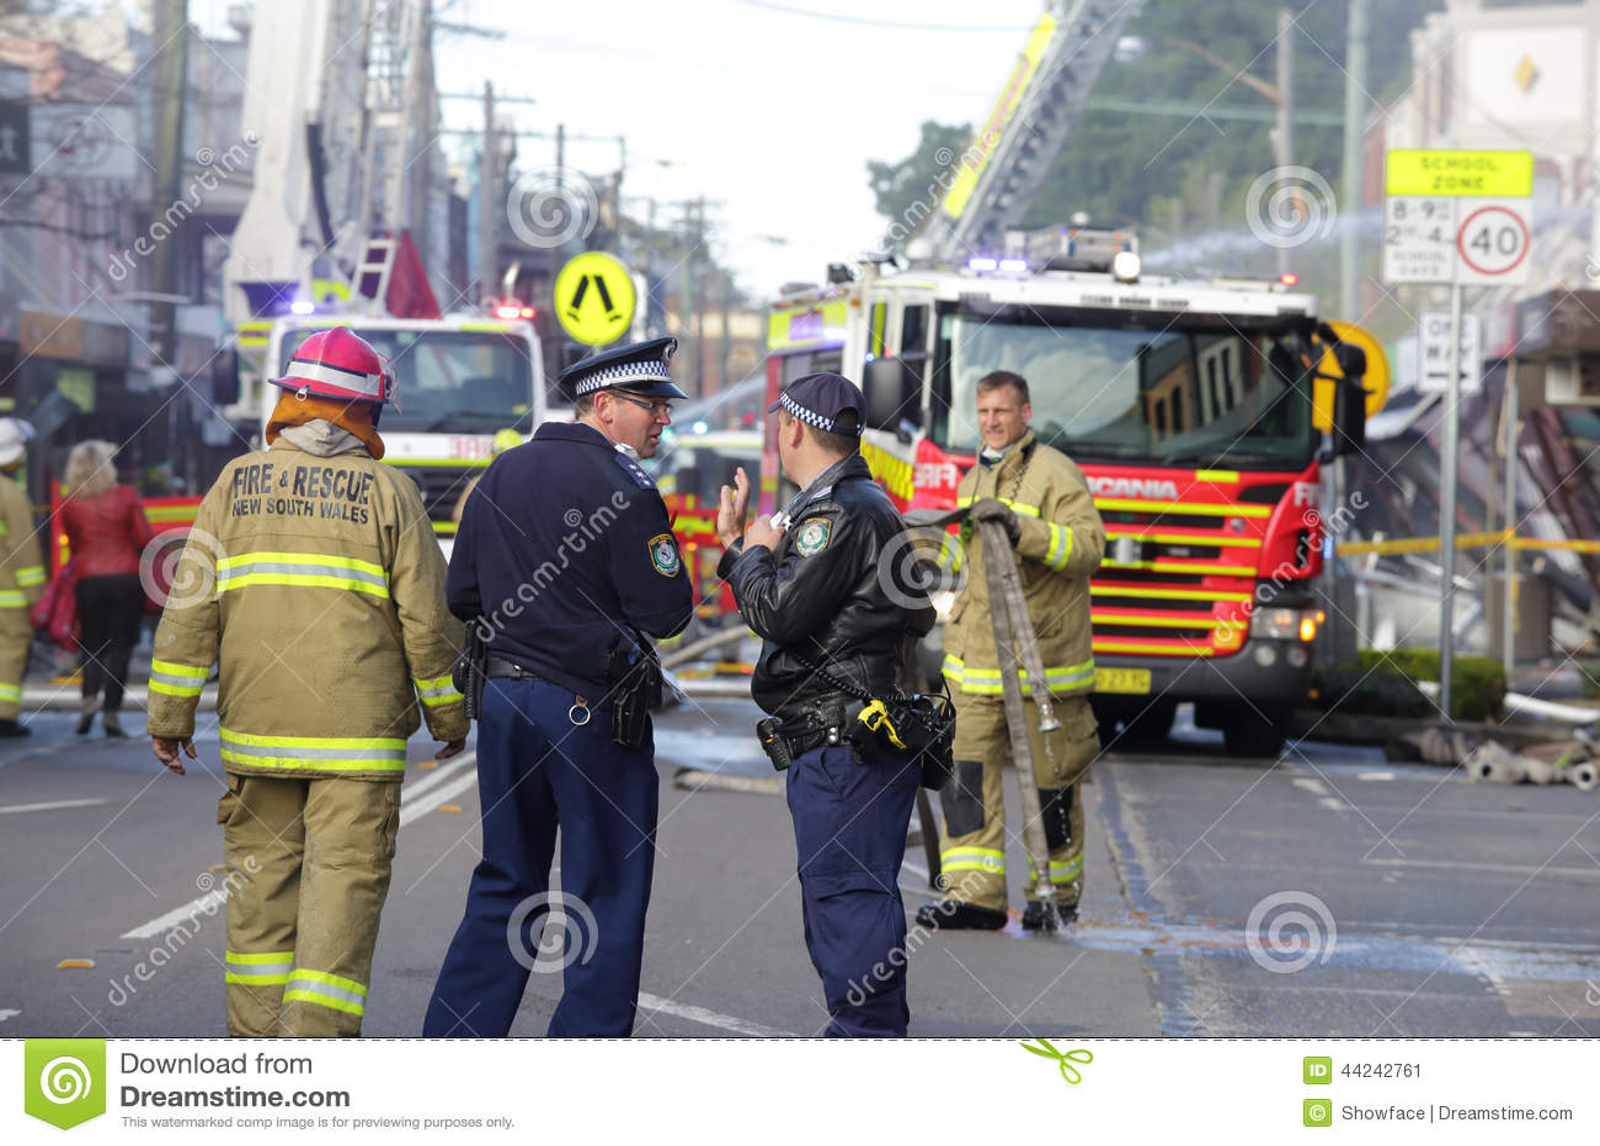 Firefighter dating site in Australia